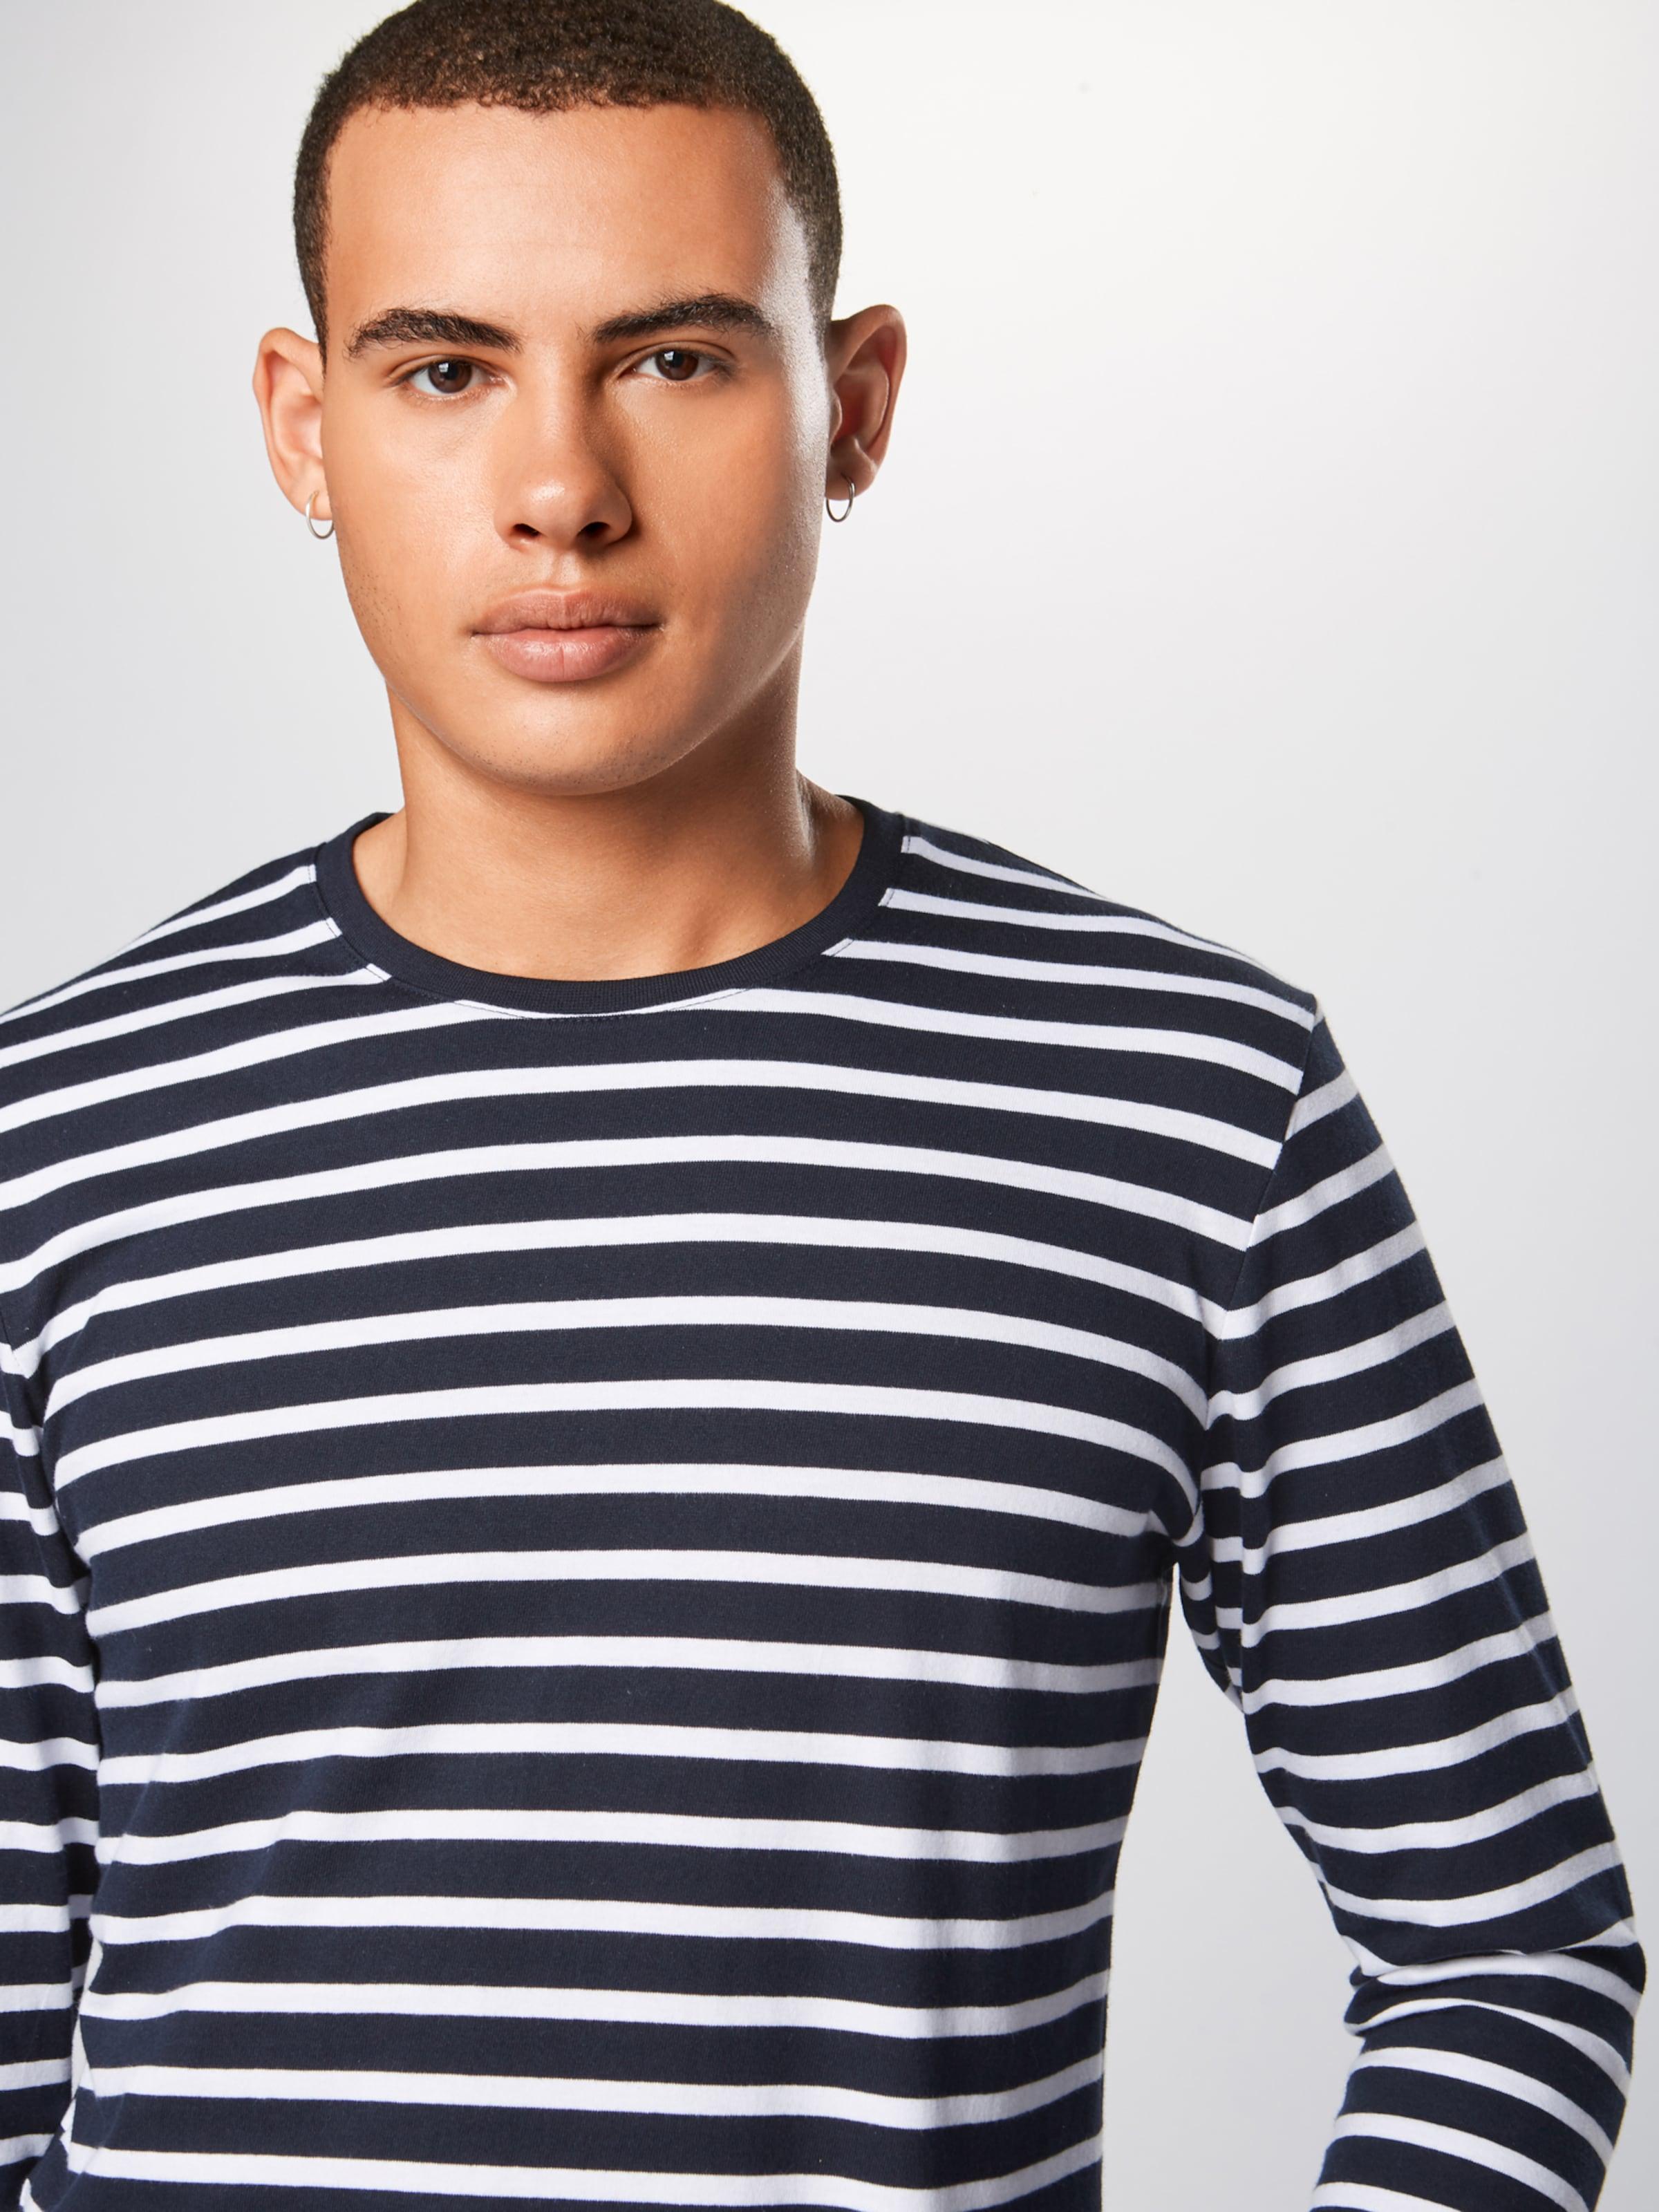 En Esprit Esprit Blanc Blanc En shirt Esprit T T shirt 80PwknOX